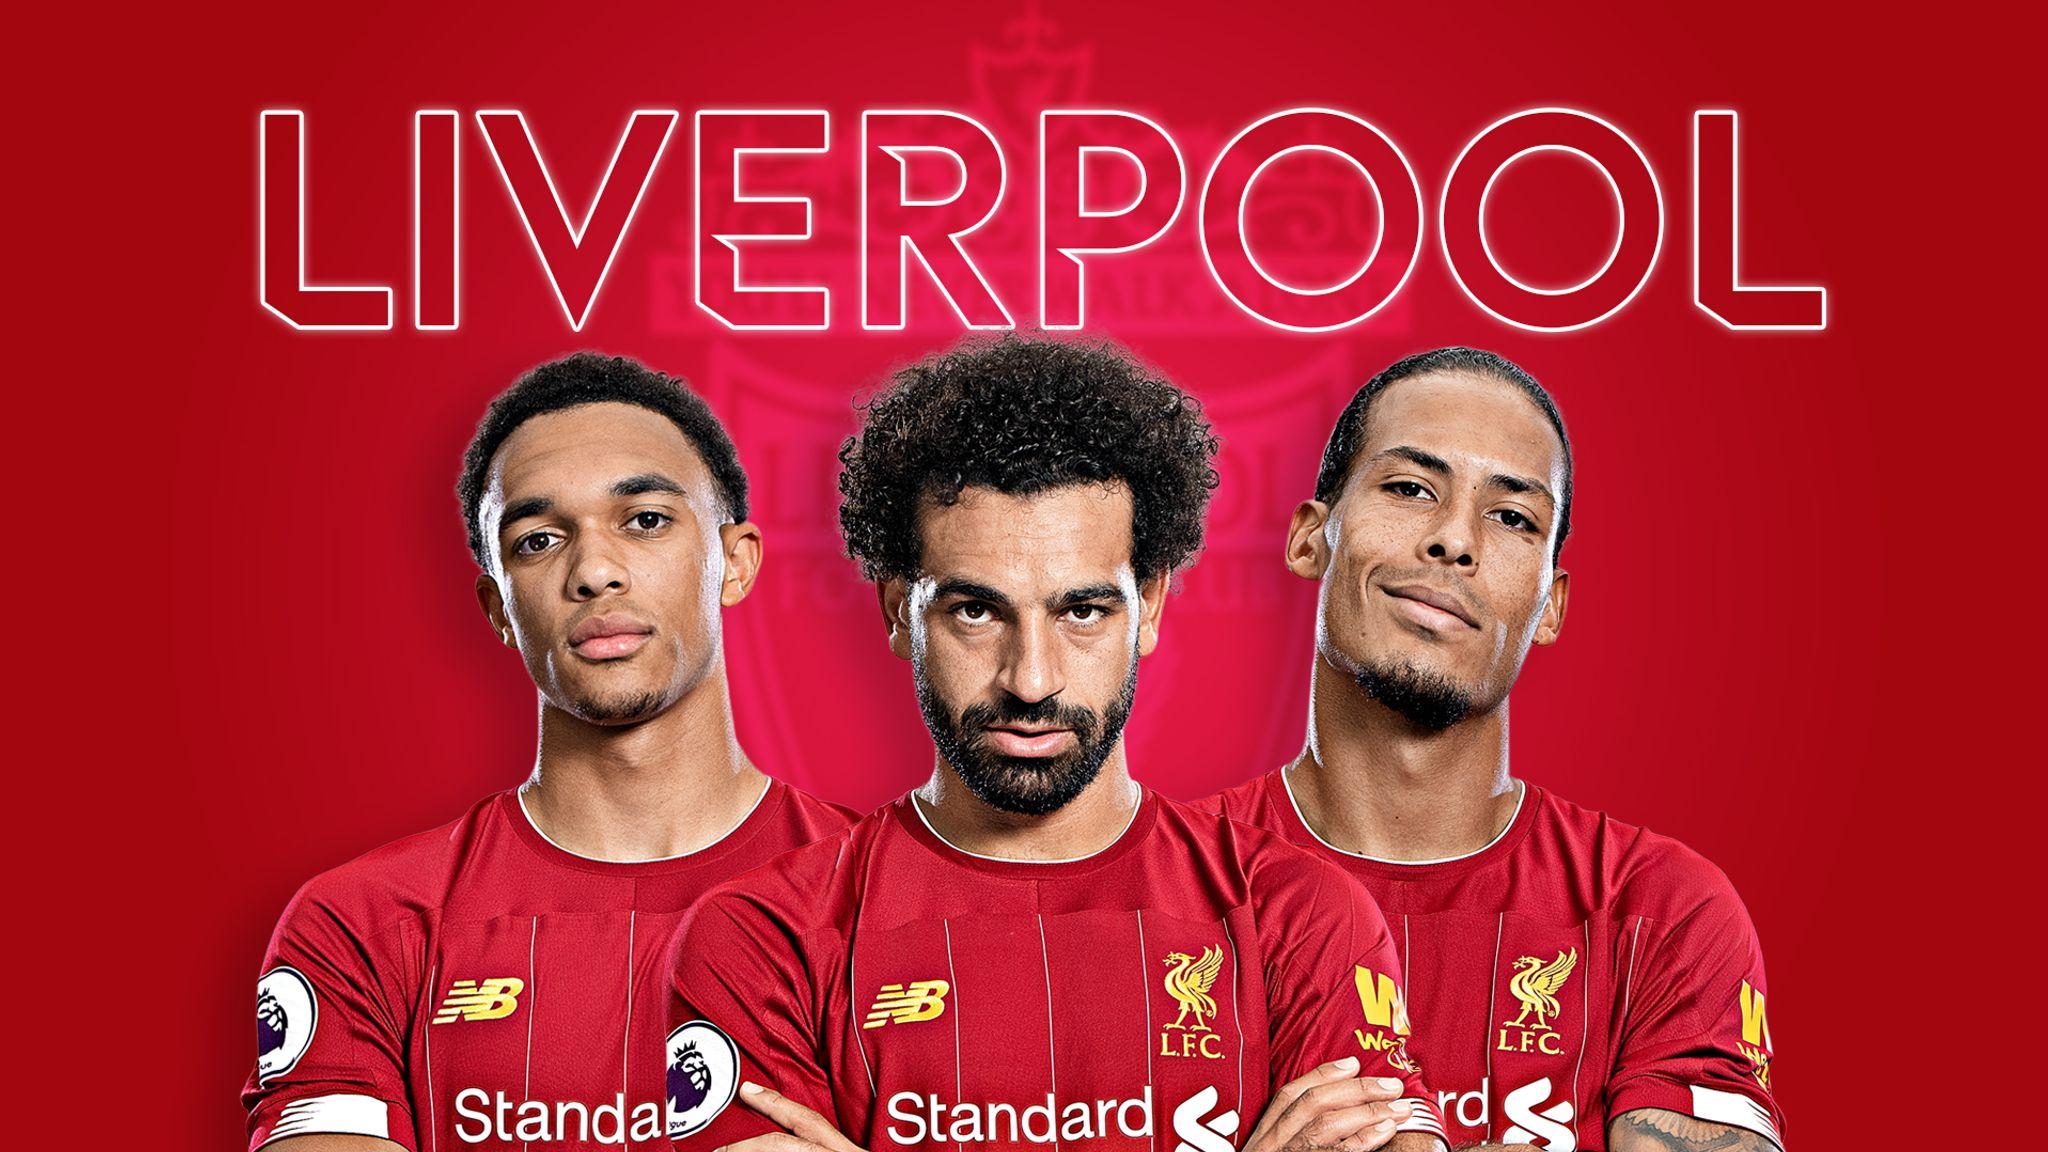 liverpool fixtures premier league 2020 21 football news sky sports liverpool fixtures premier league 2020